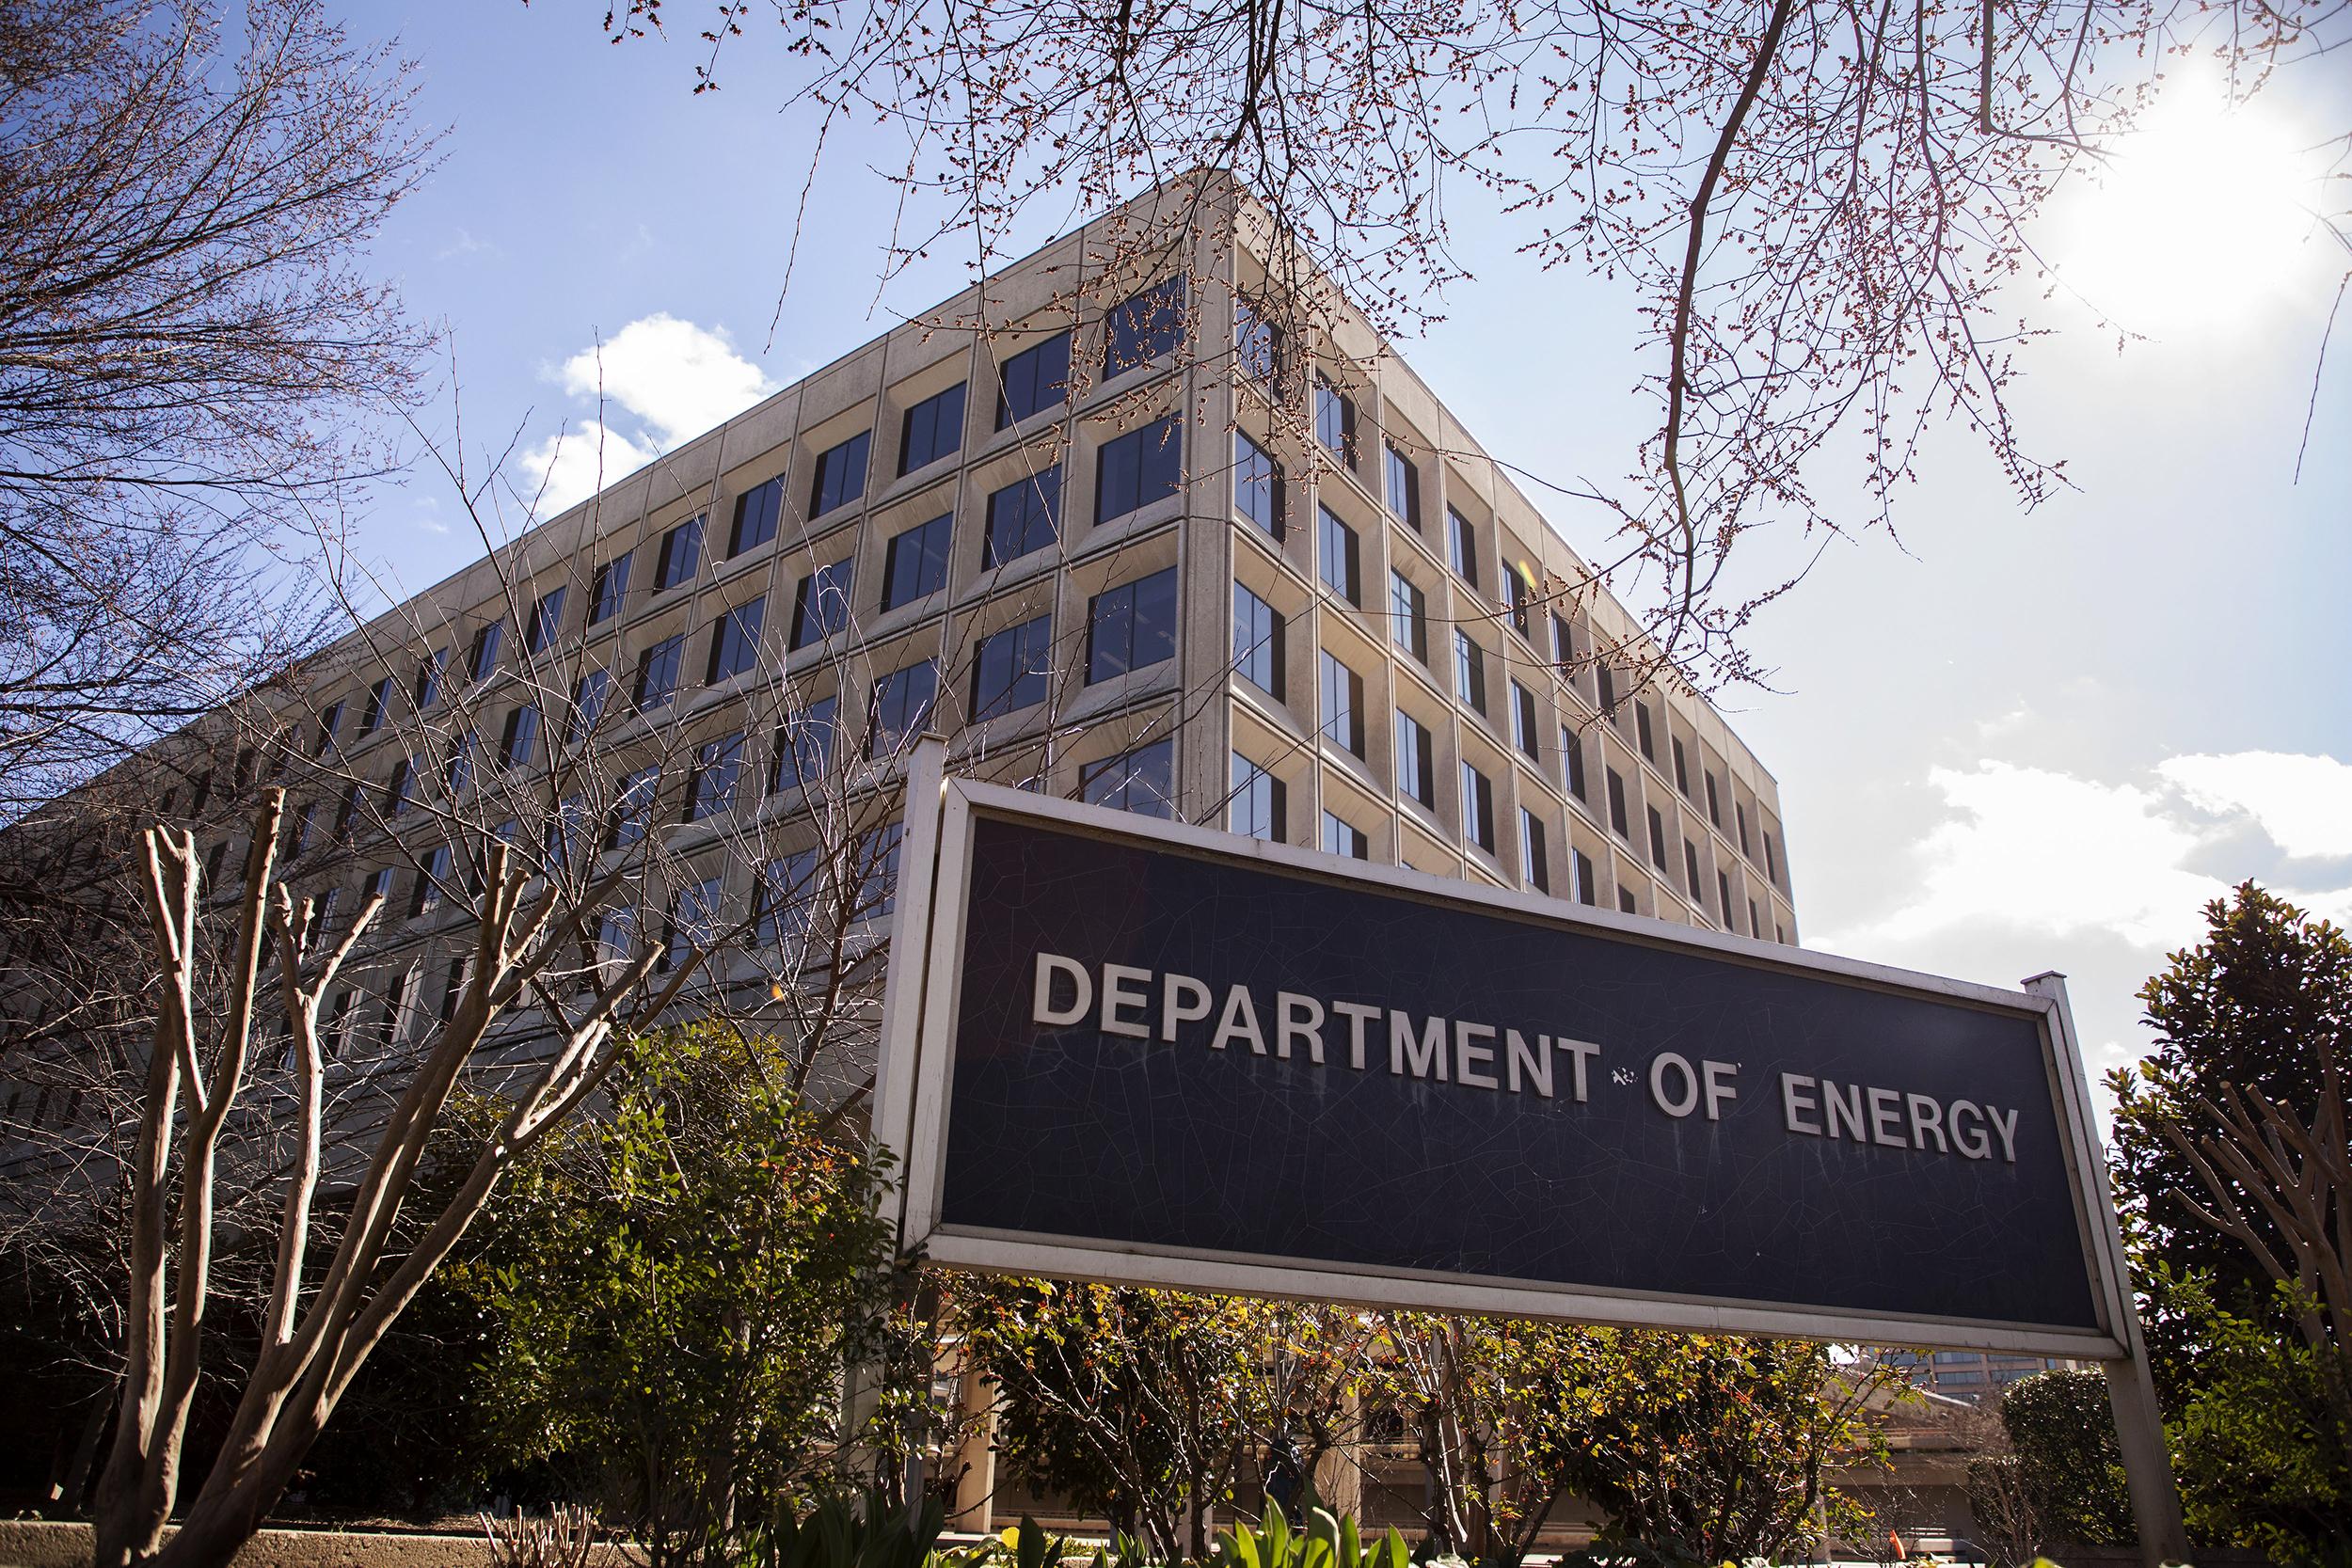 201217-dept-energy-exterior-us-ac-554p_6